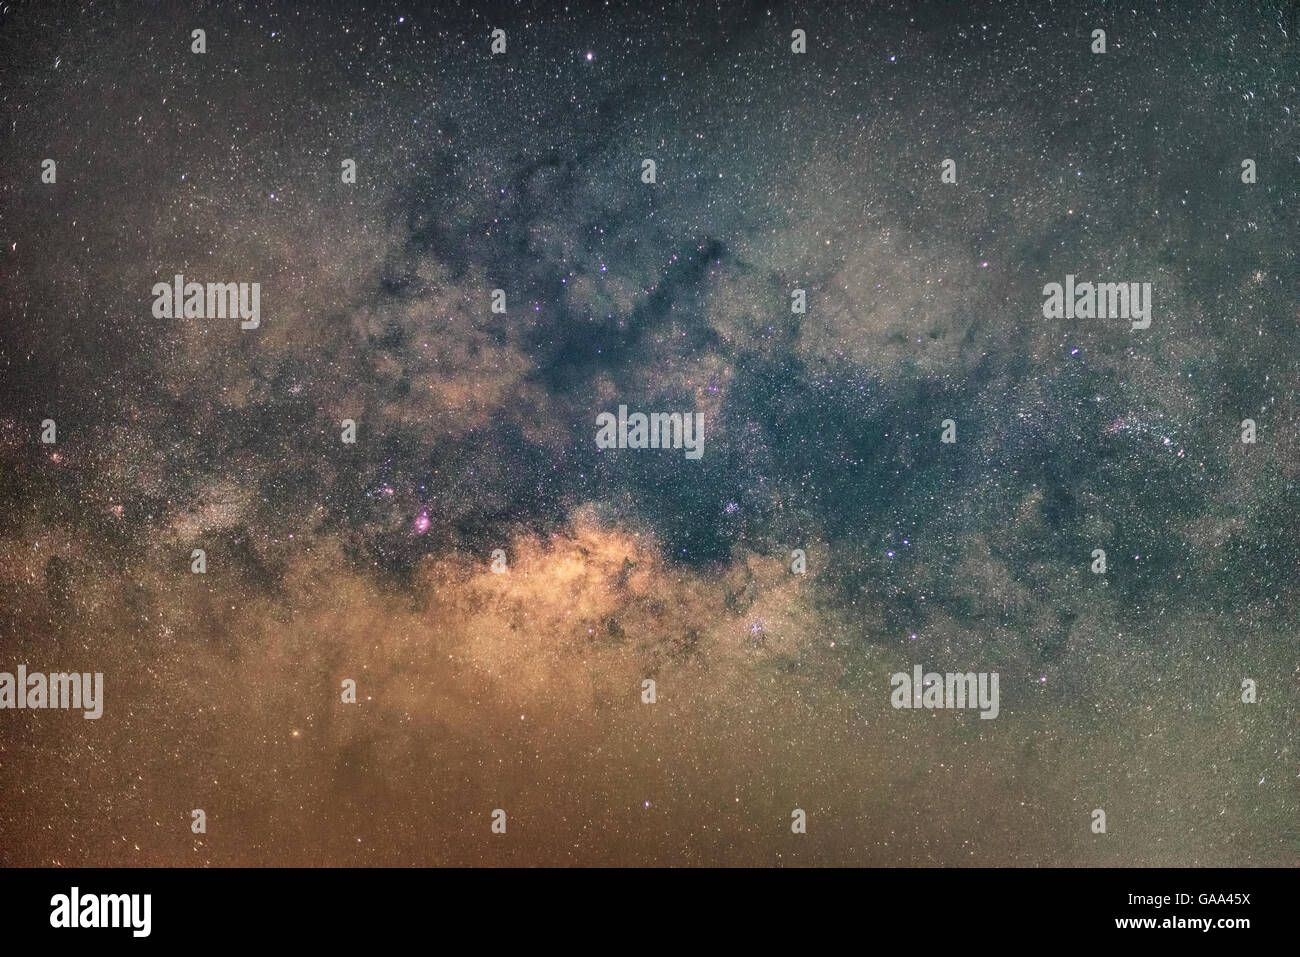 Close-up of Milky Way,Long exposure photograph - Stock Image